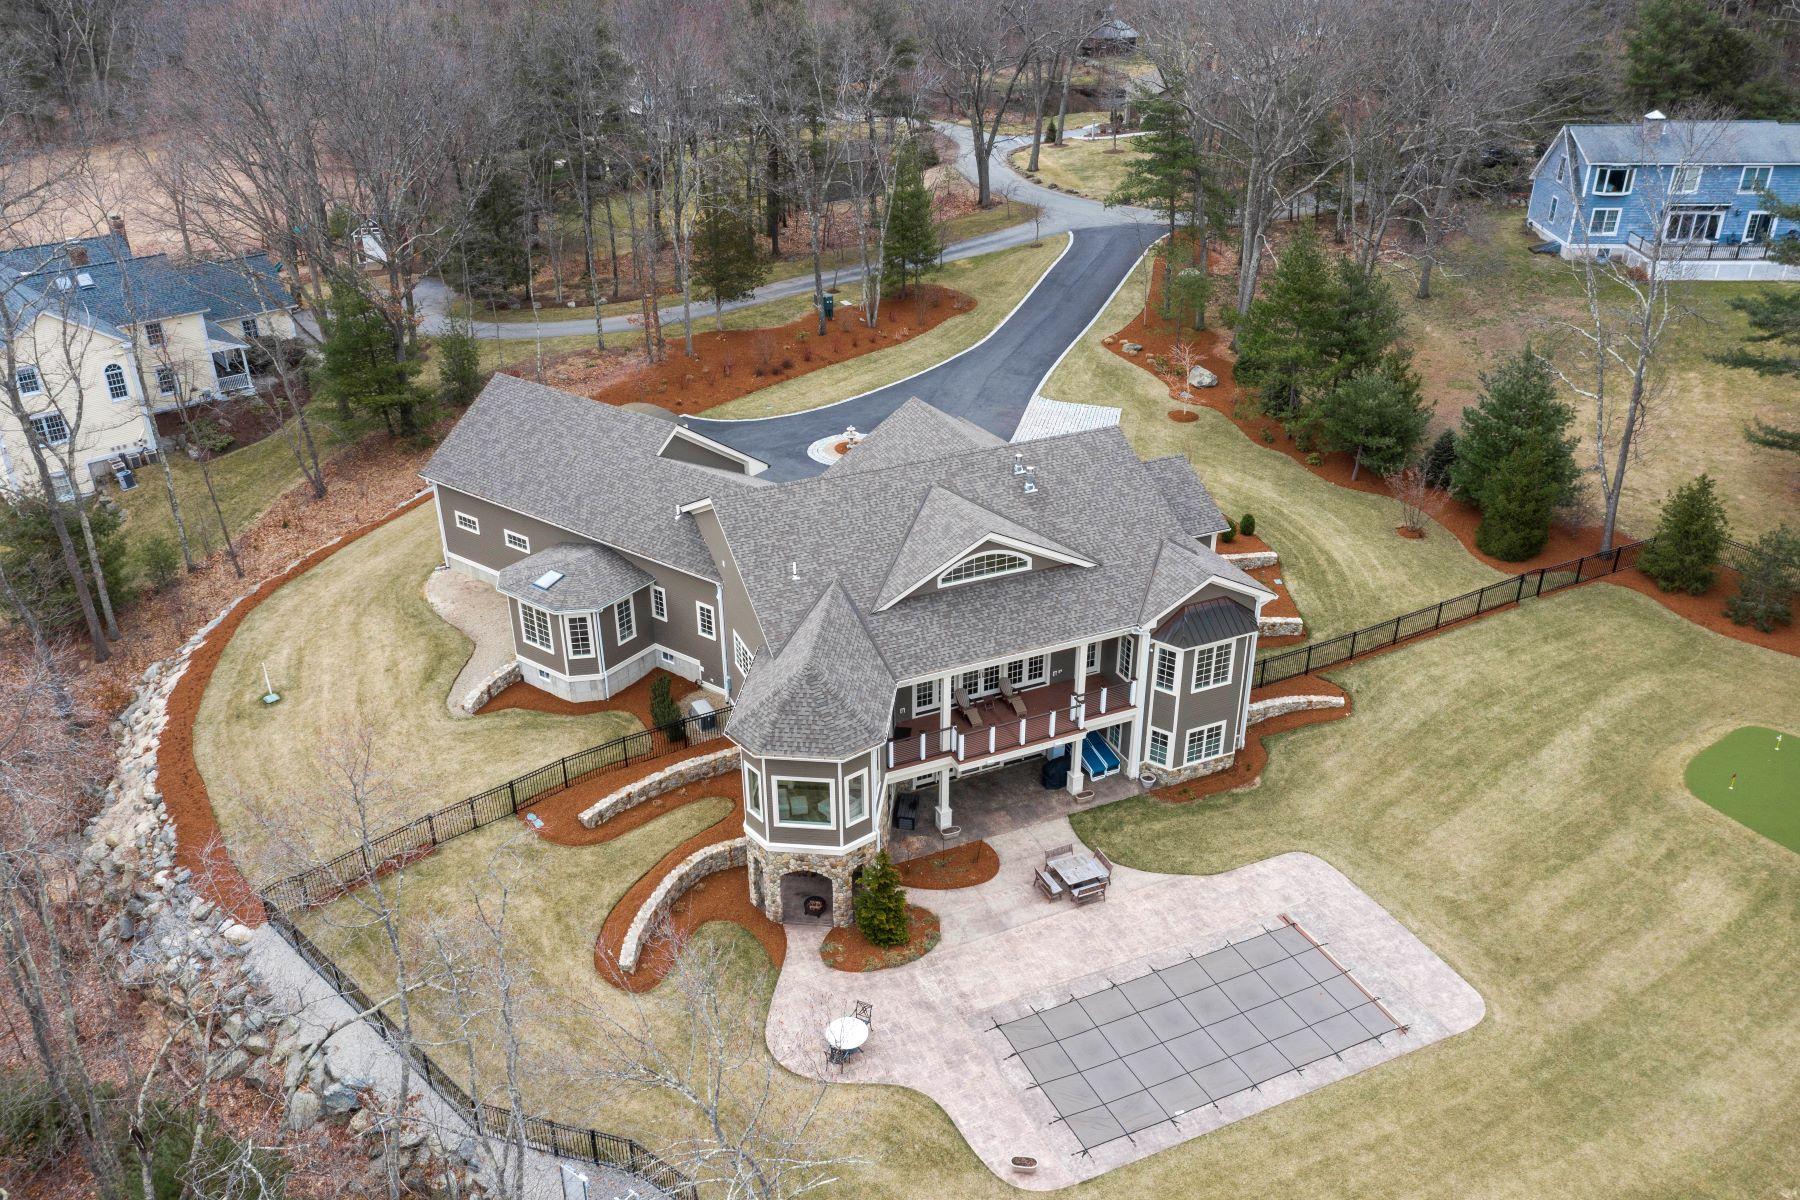 Single Family Homes για την Πώληση στο 87 Old County Road 87 Old County Rd, Waltham, Μασαχουσετη 01783 Ηνωμένες Πολιτείες